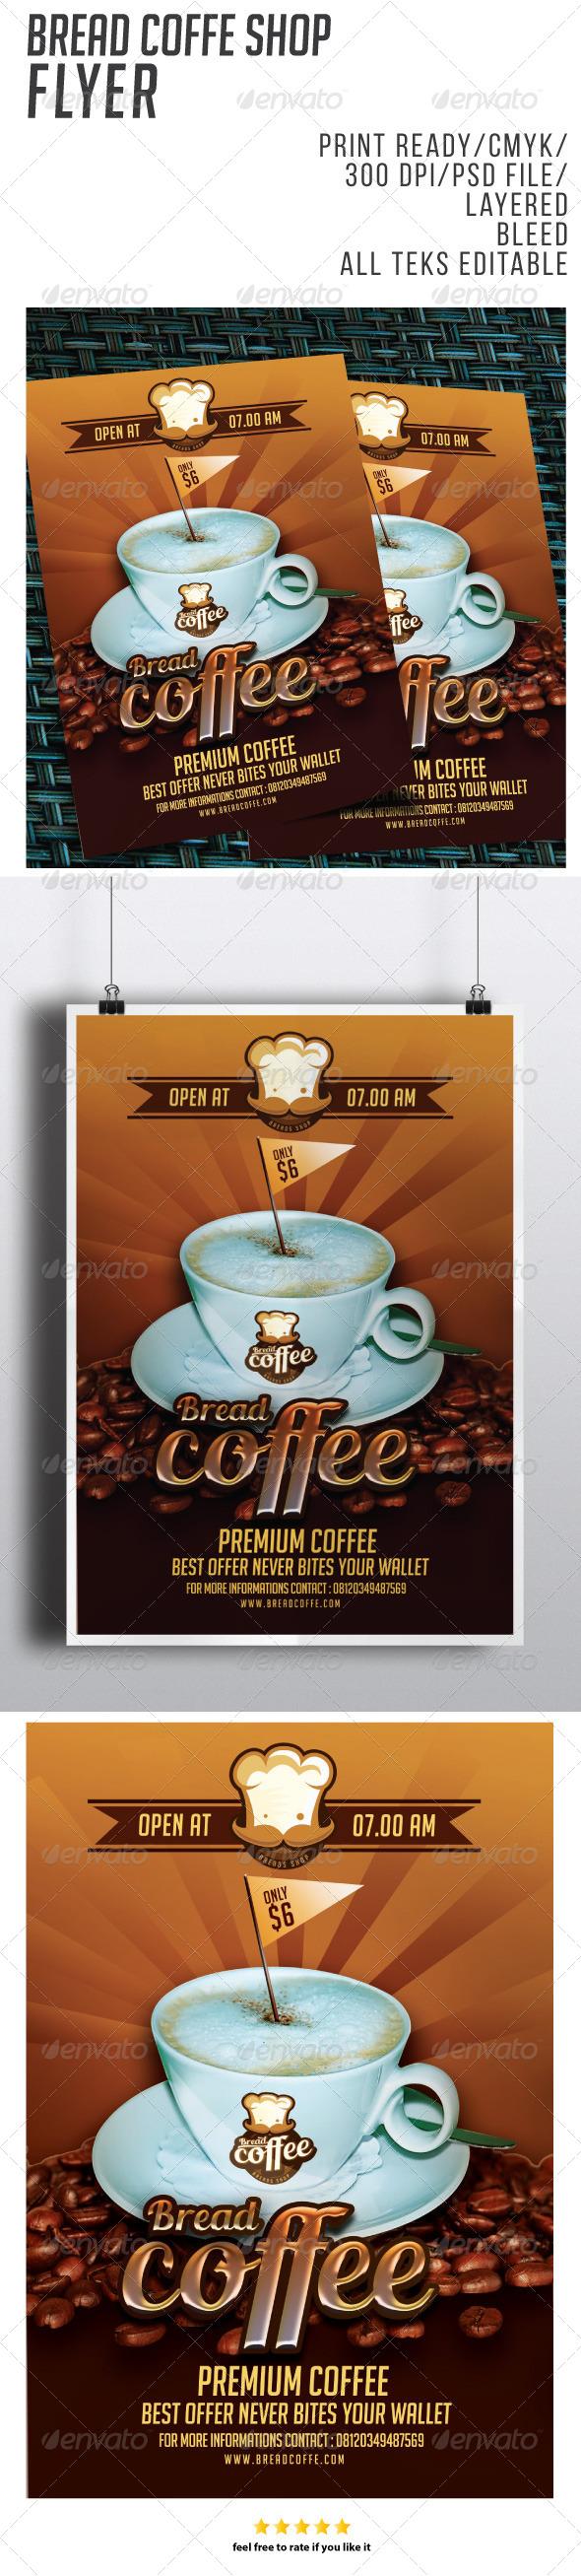 Bread Coffe Flyer - Miscellaneous Events